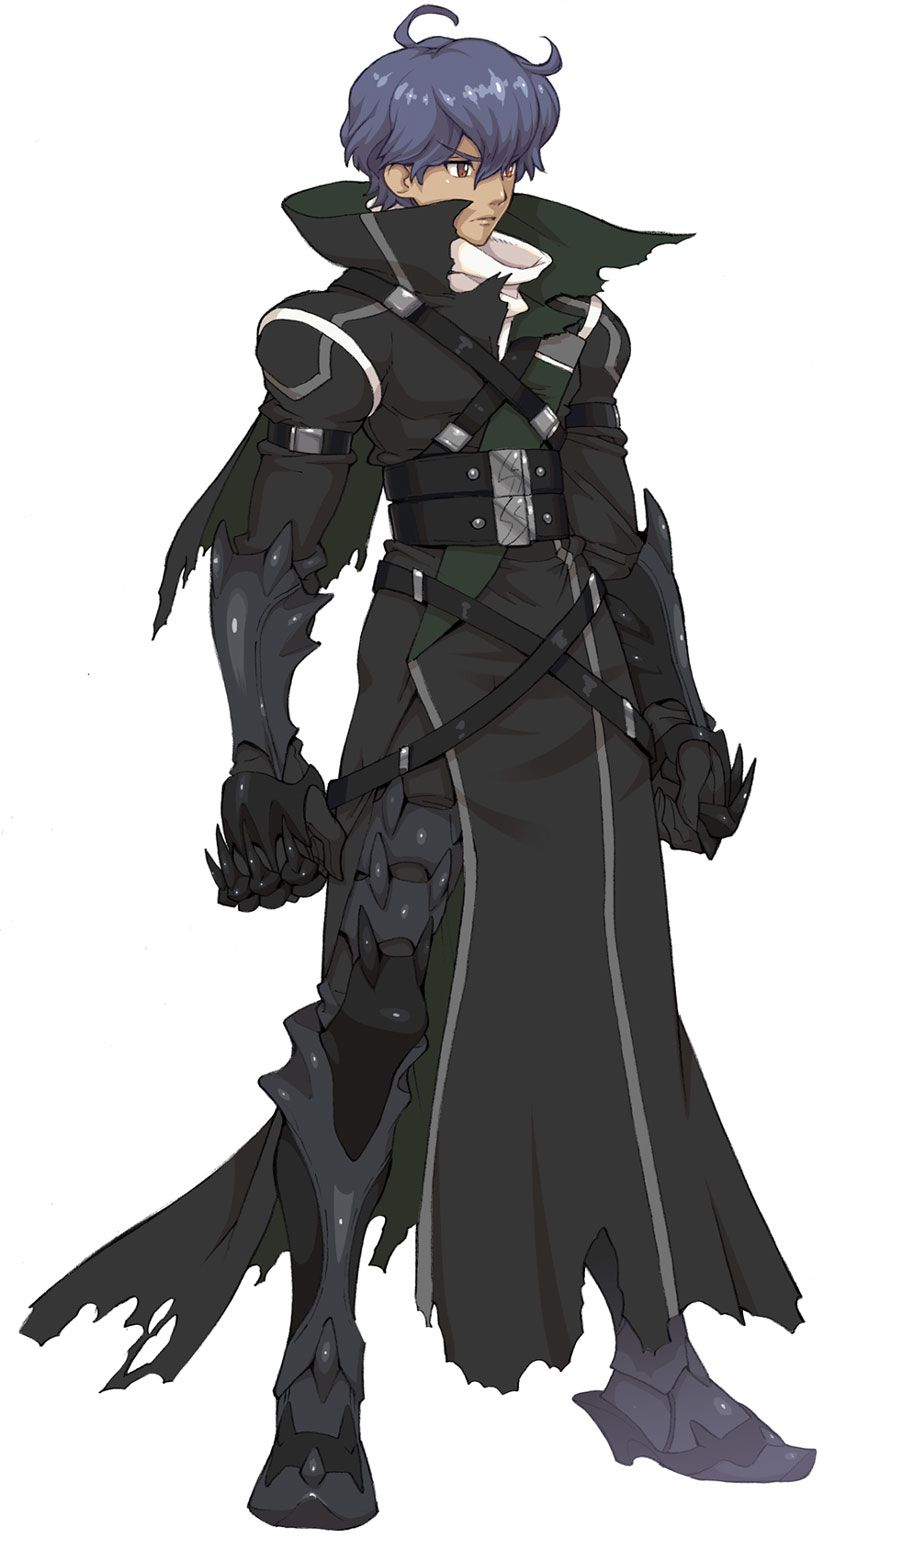 Felius Arwin from Wild Arms XF